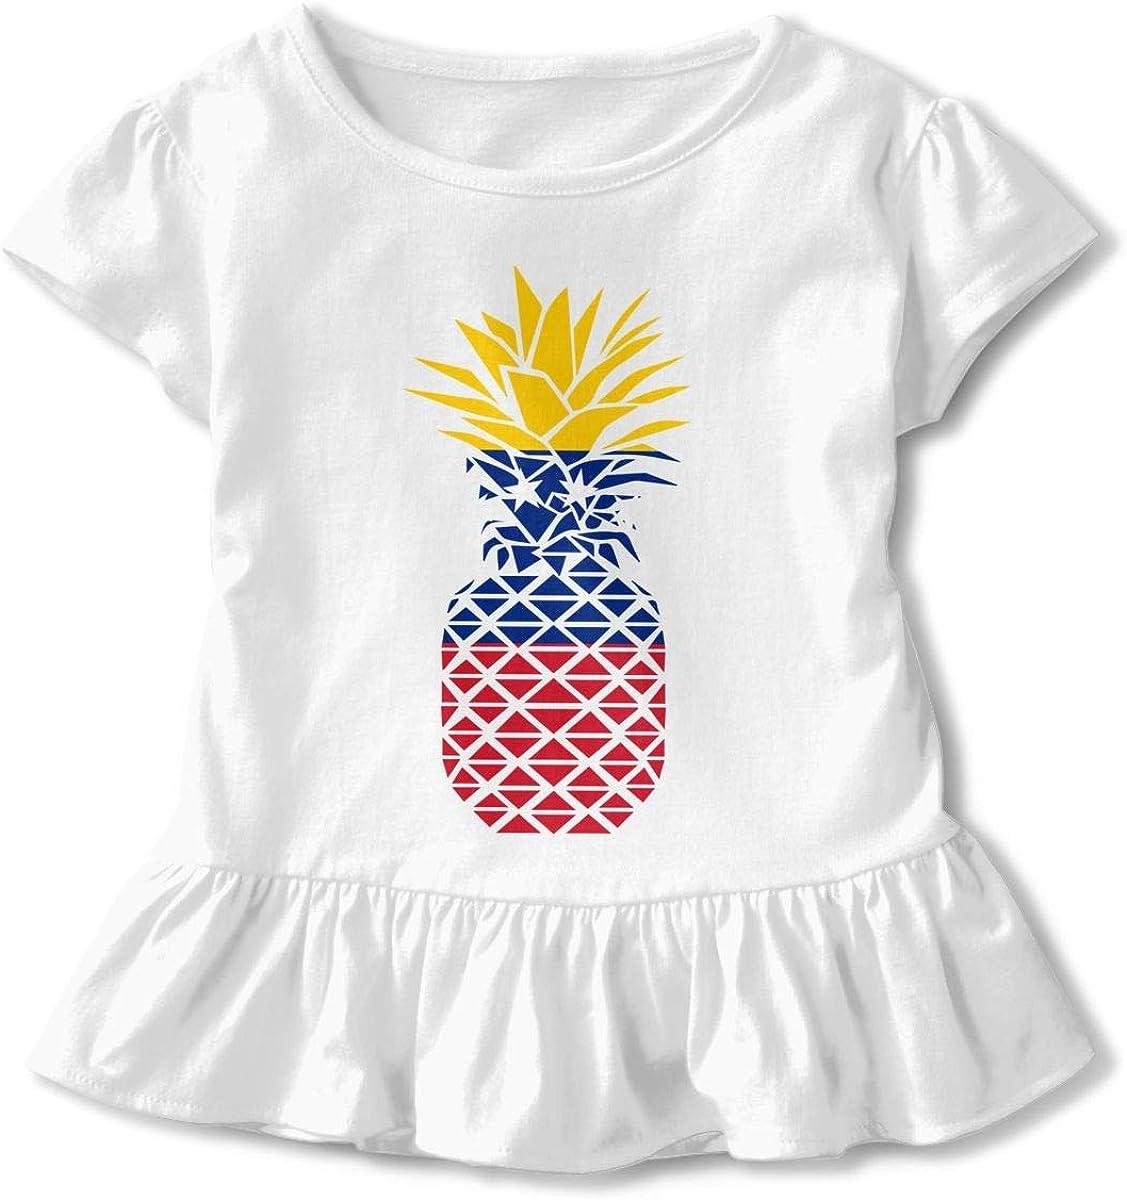 26NSHIRT Venezuela Flag Pineapple Toddler Girls Short Sleeve Peplum Top